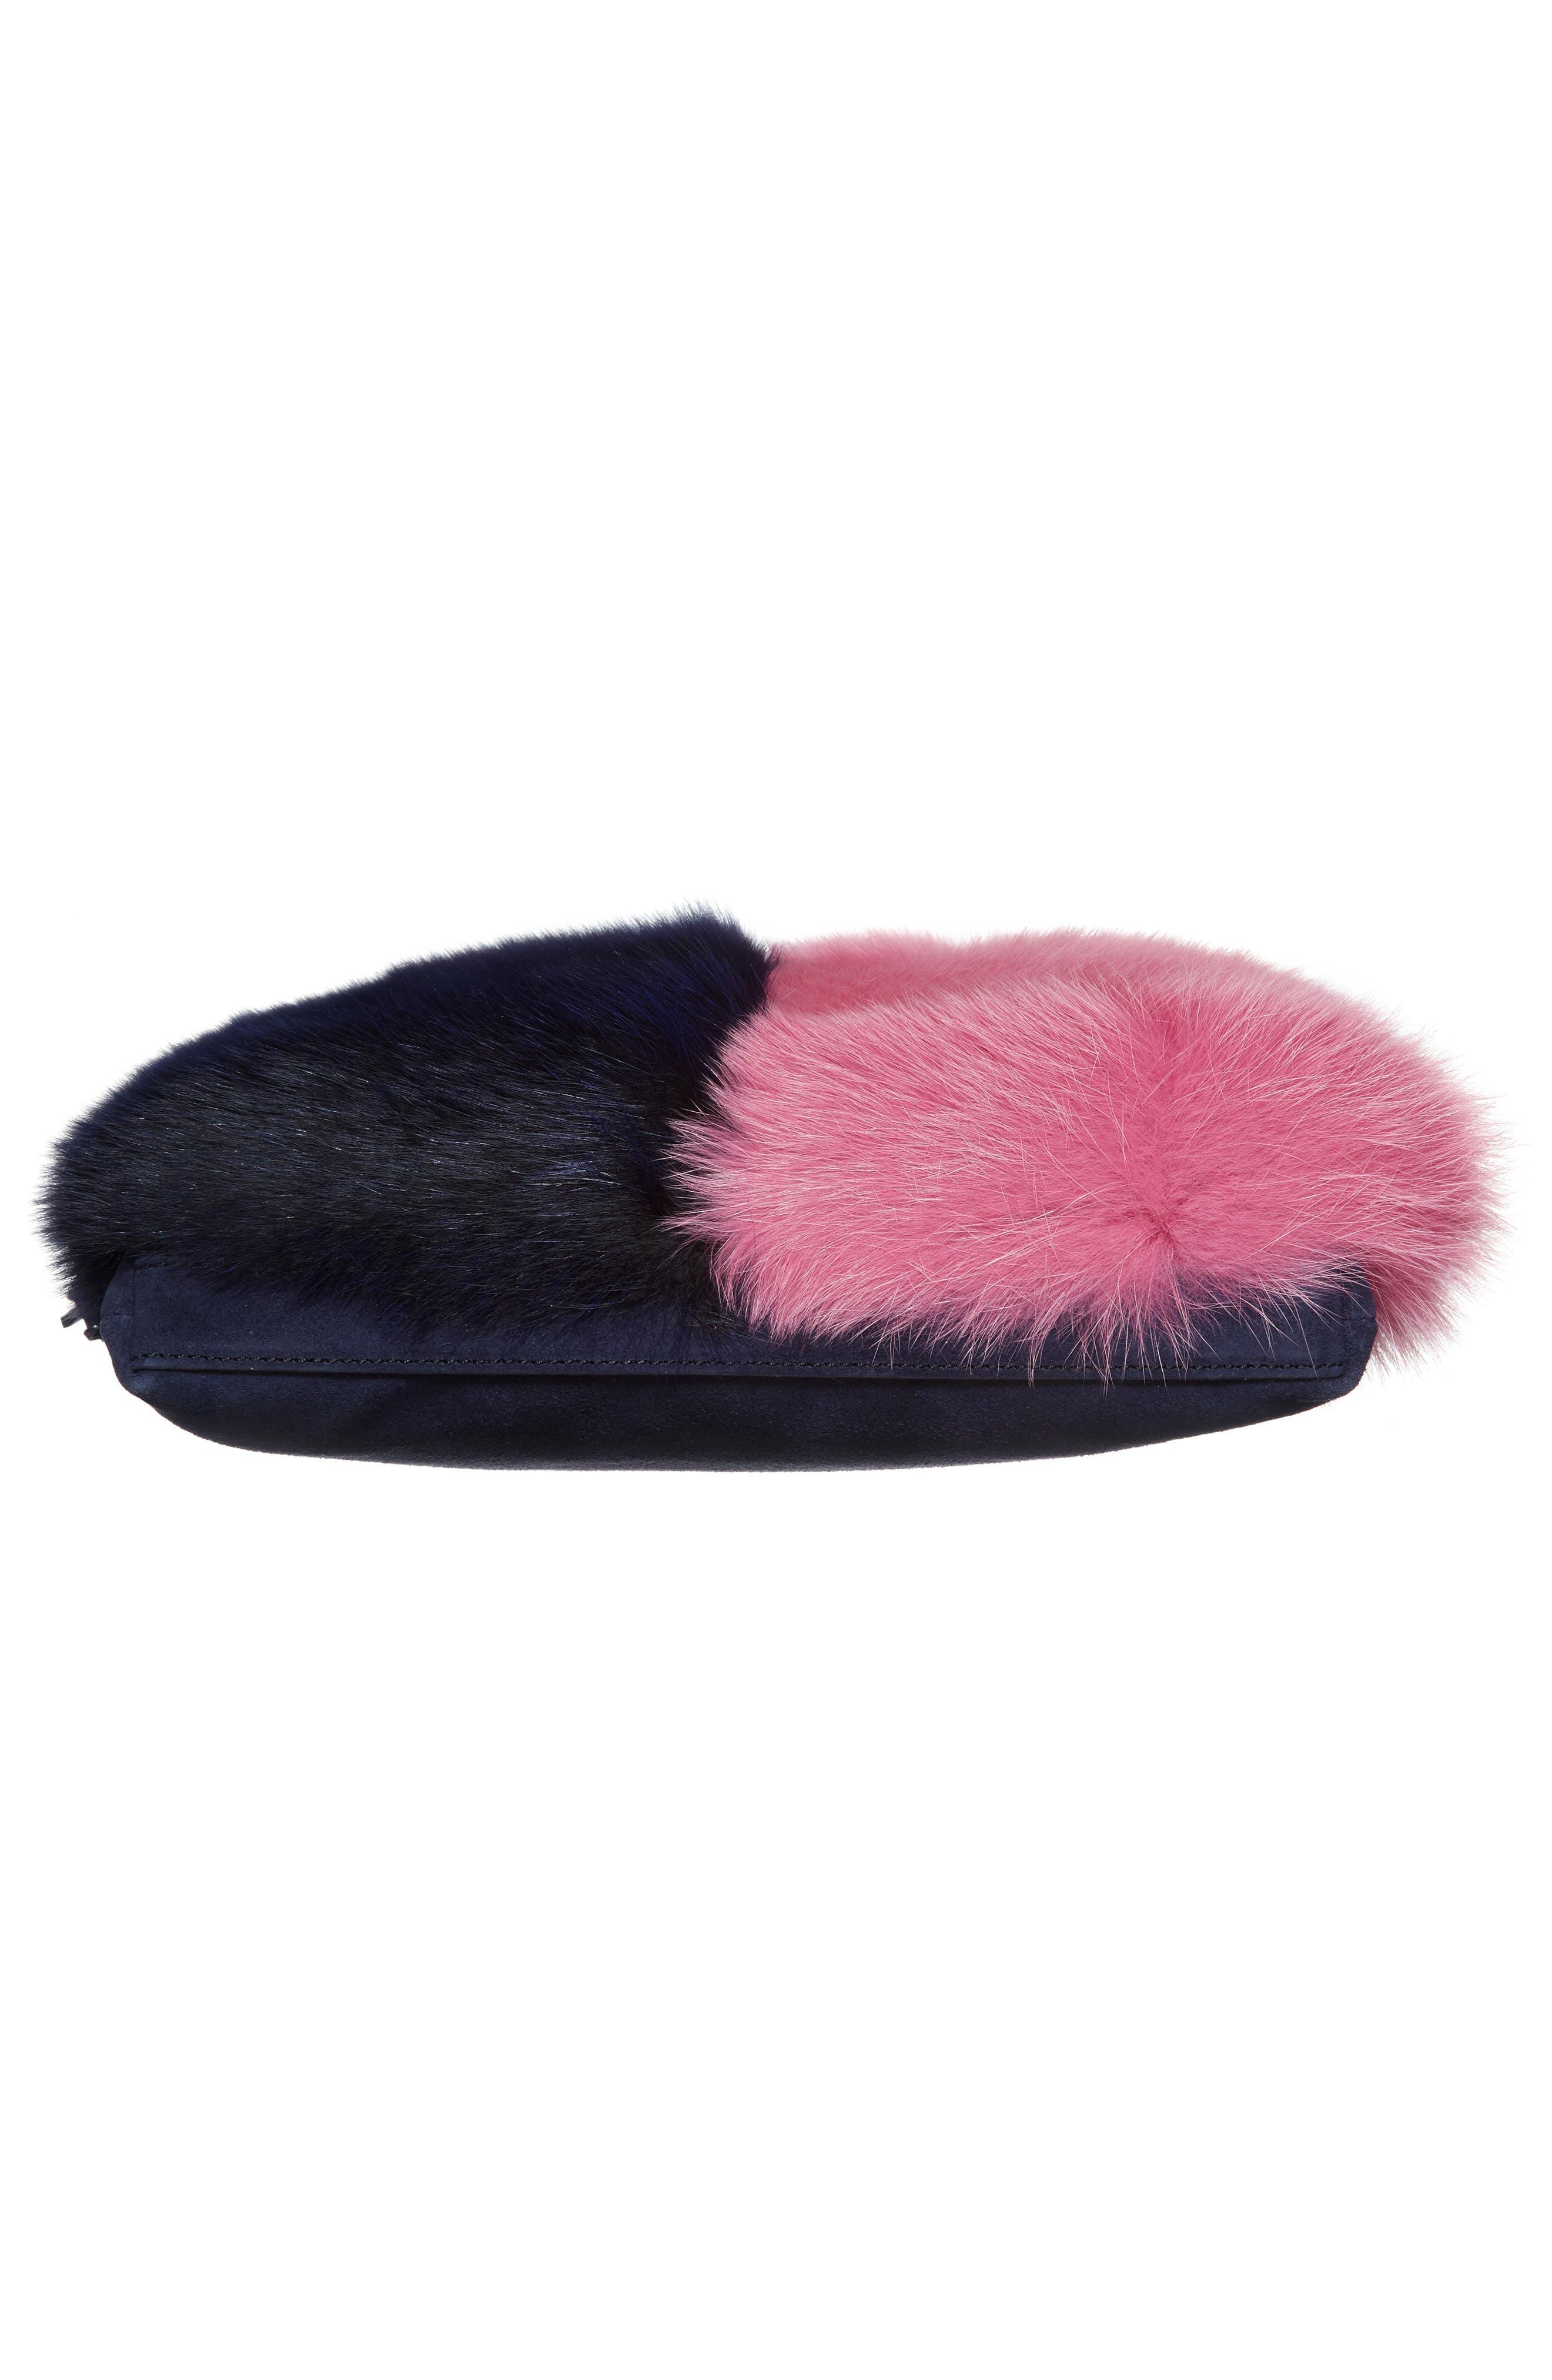 Genuine Fox Fur Tassel Pouch,                             Alternate thumbnail 6, color,                             Eclipse/ Hot Pink